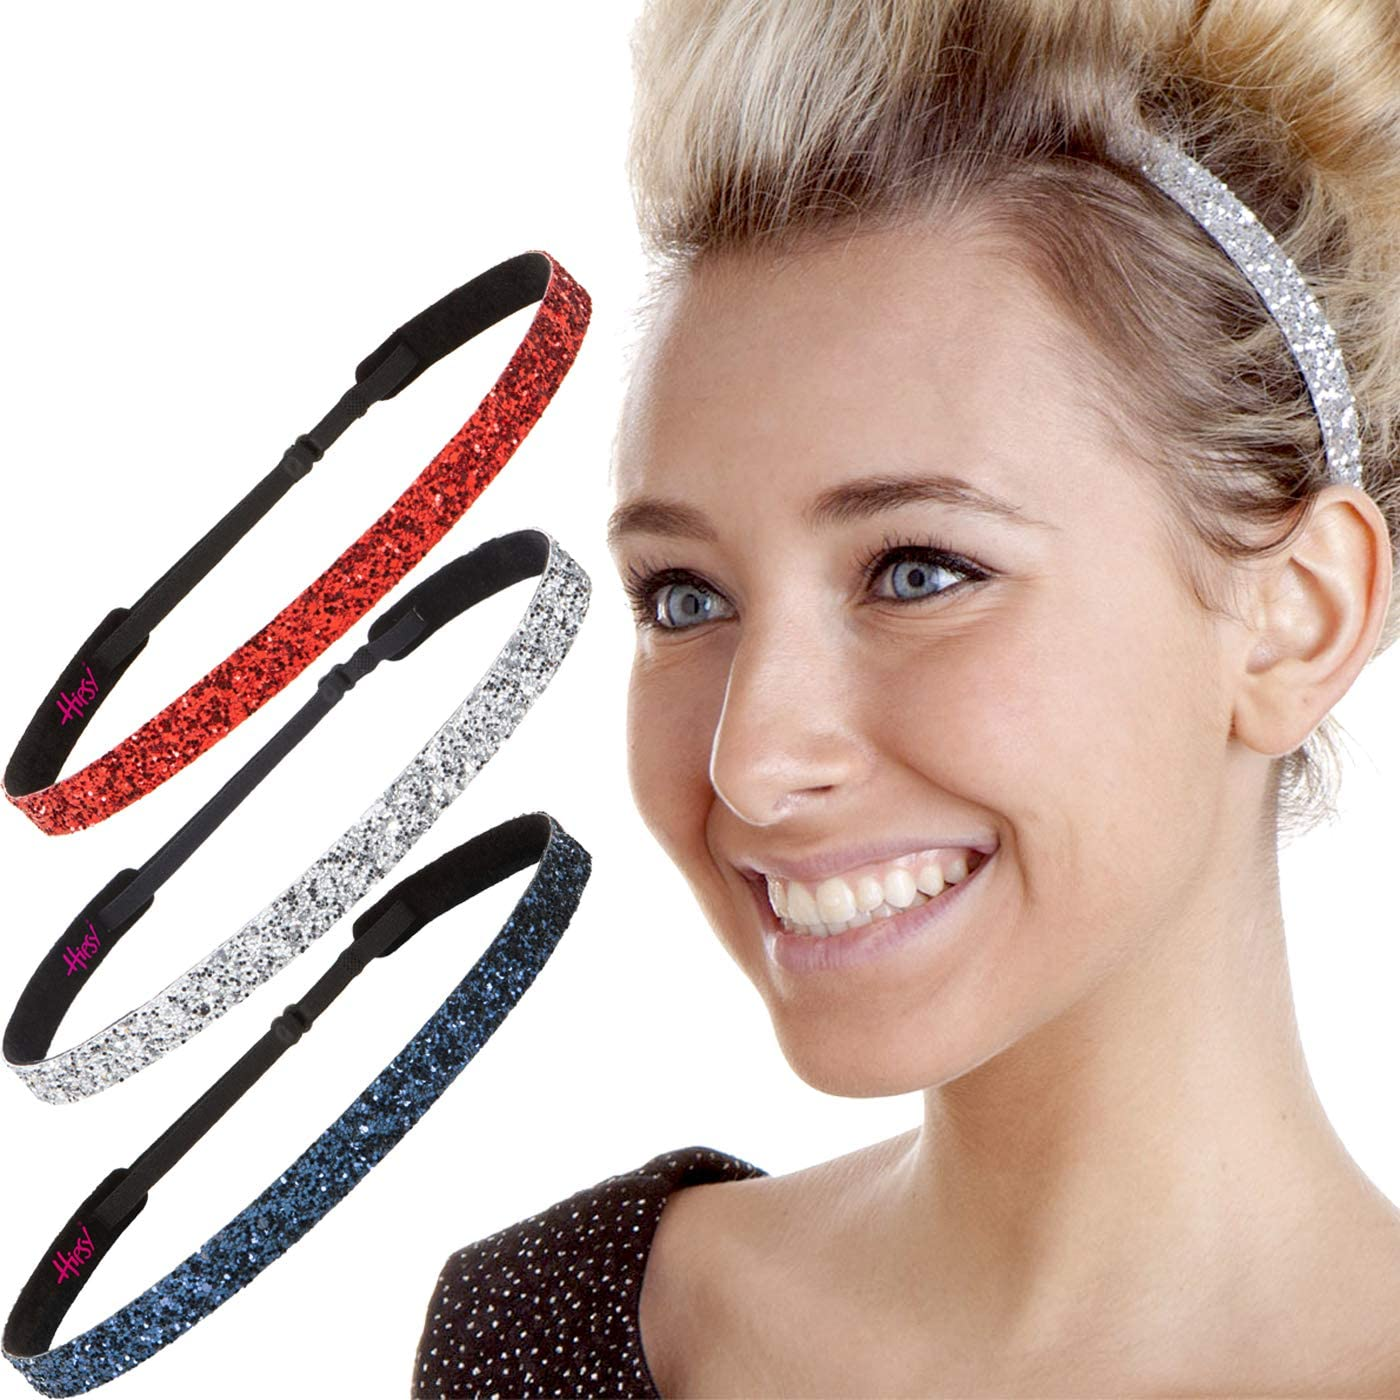 Hipsy Regular Size, Adjustable No Slip Sparkly Bling Glitter Skinny 3pk Headbands for Women Girls & Teens